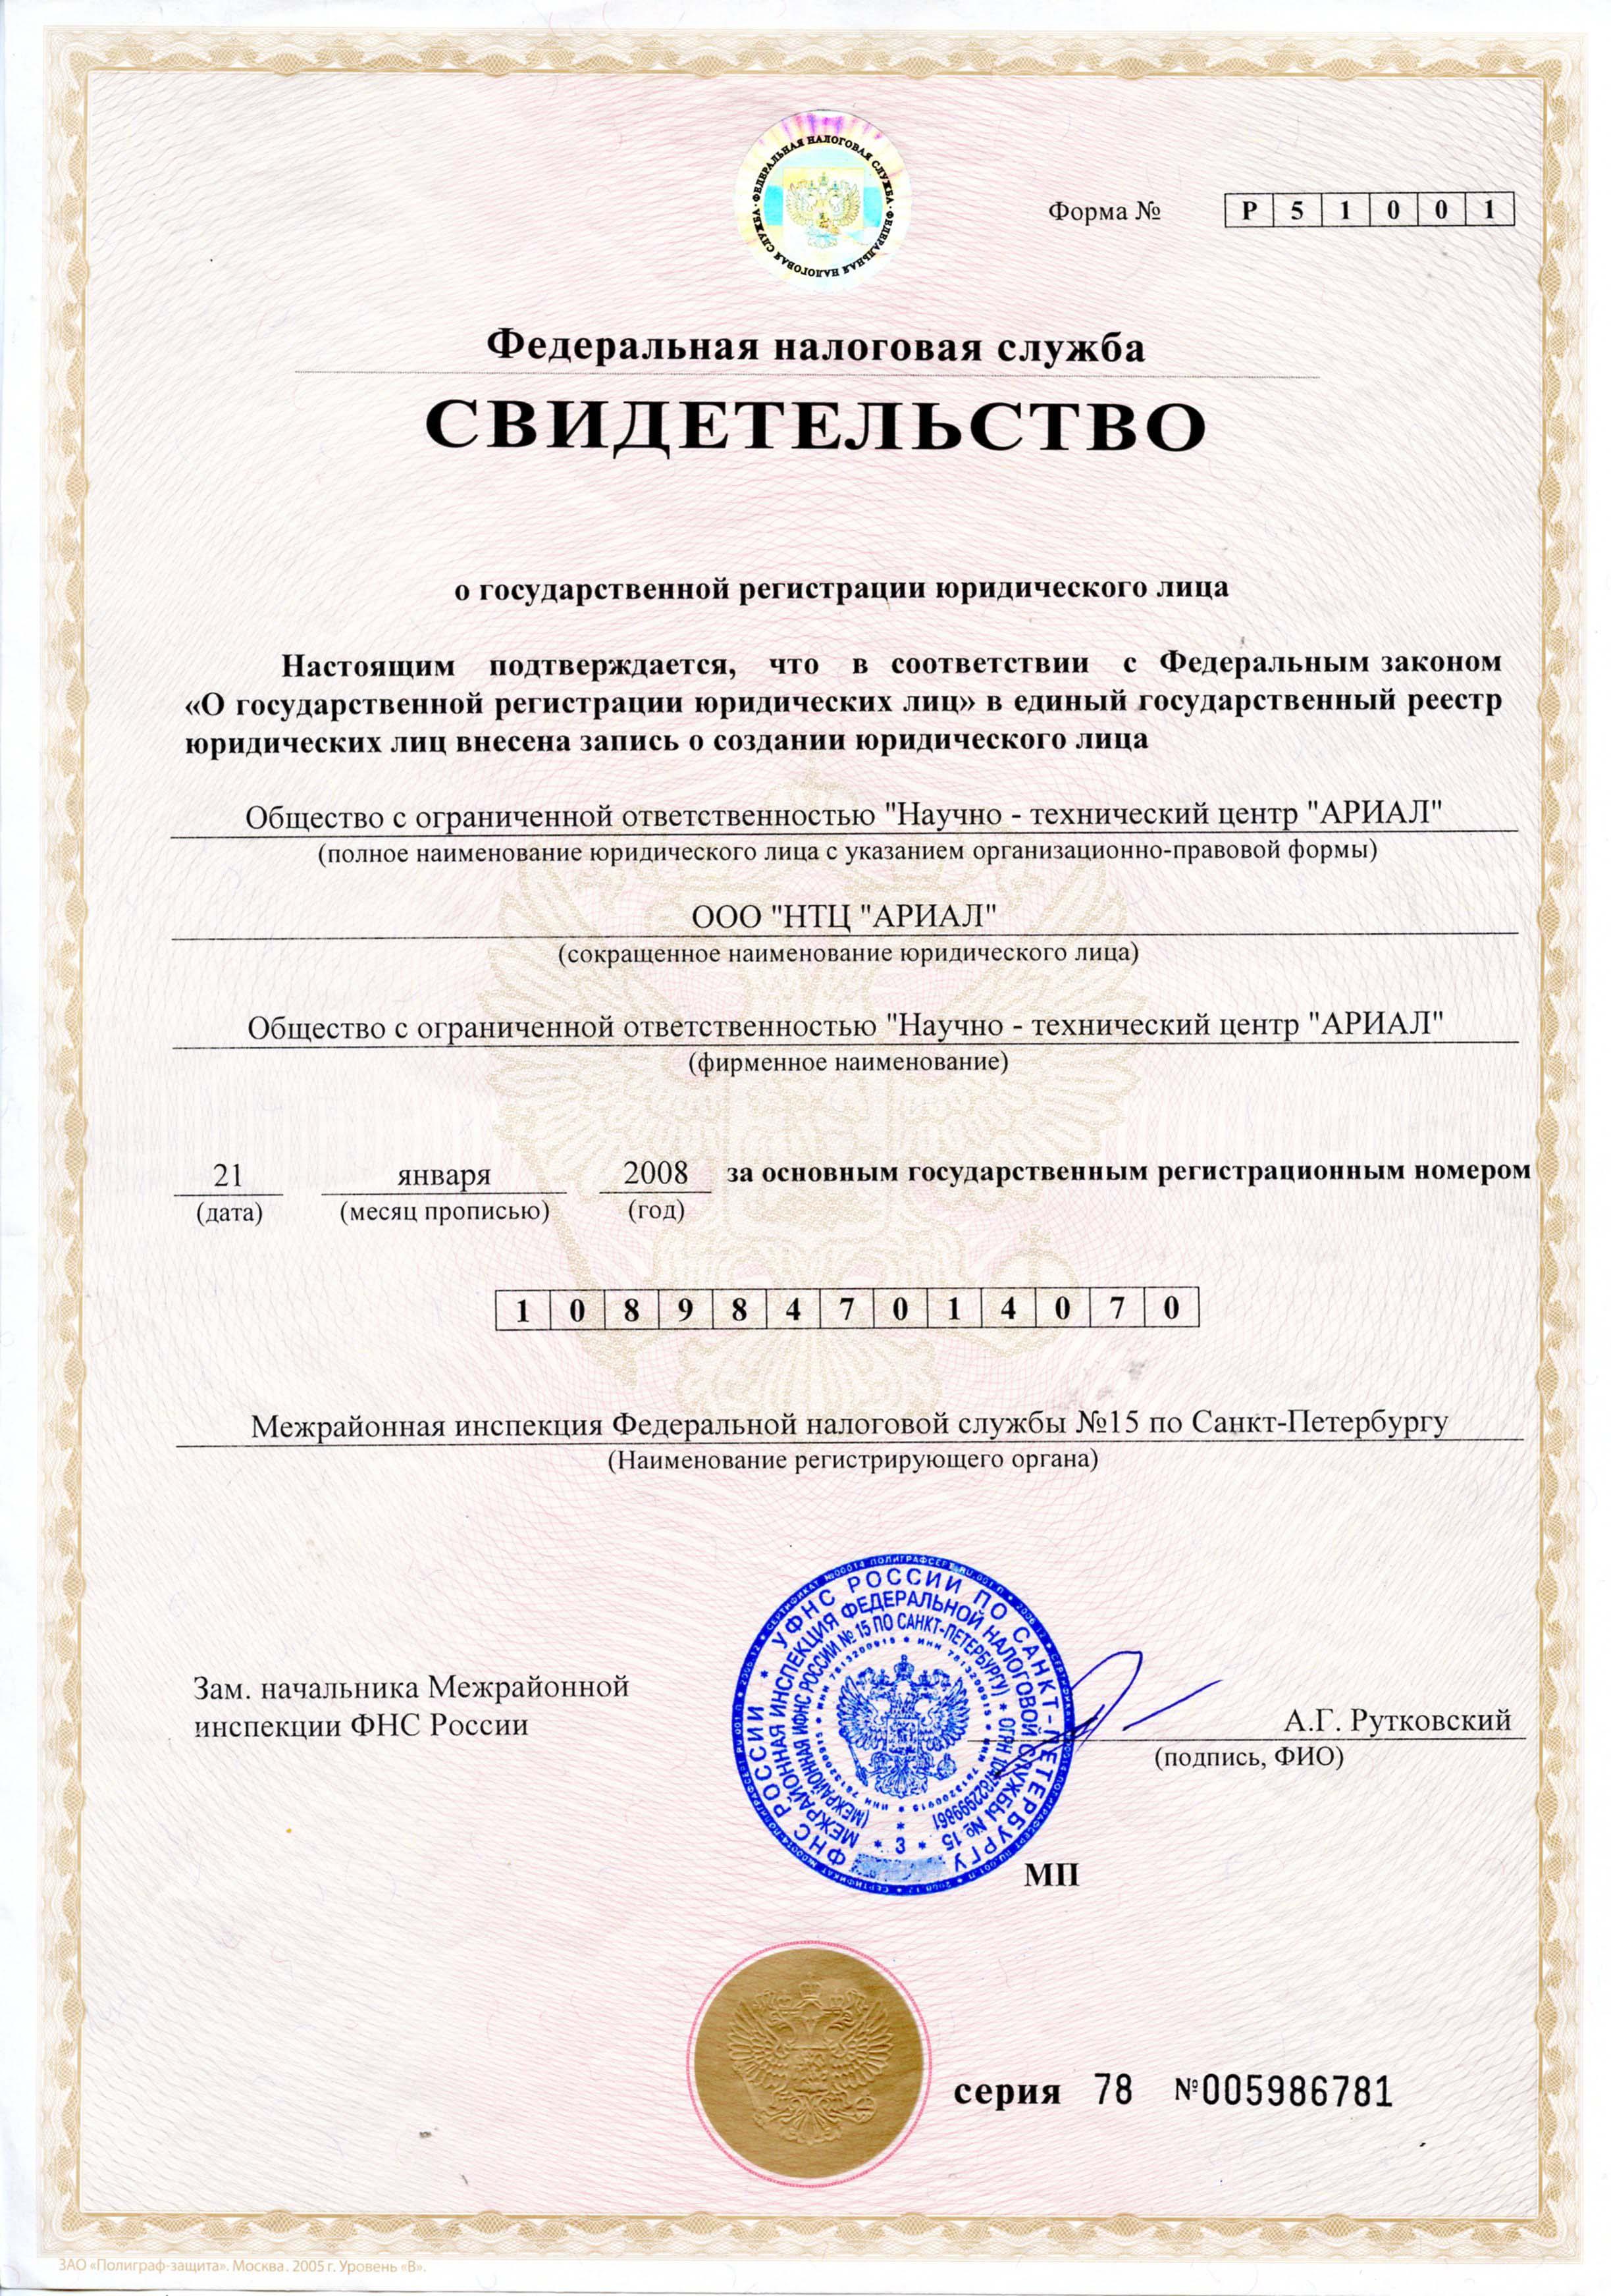 ОГРН-ООО НТЦ АРИАЛ1